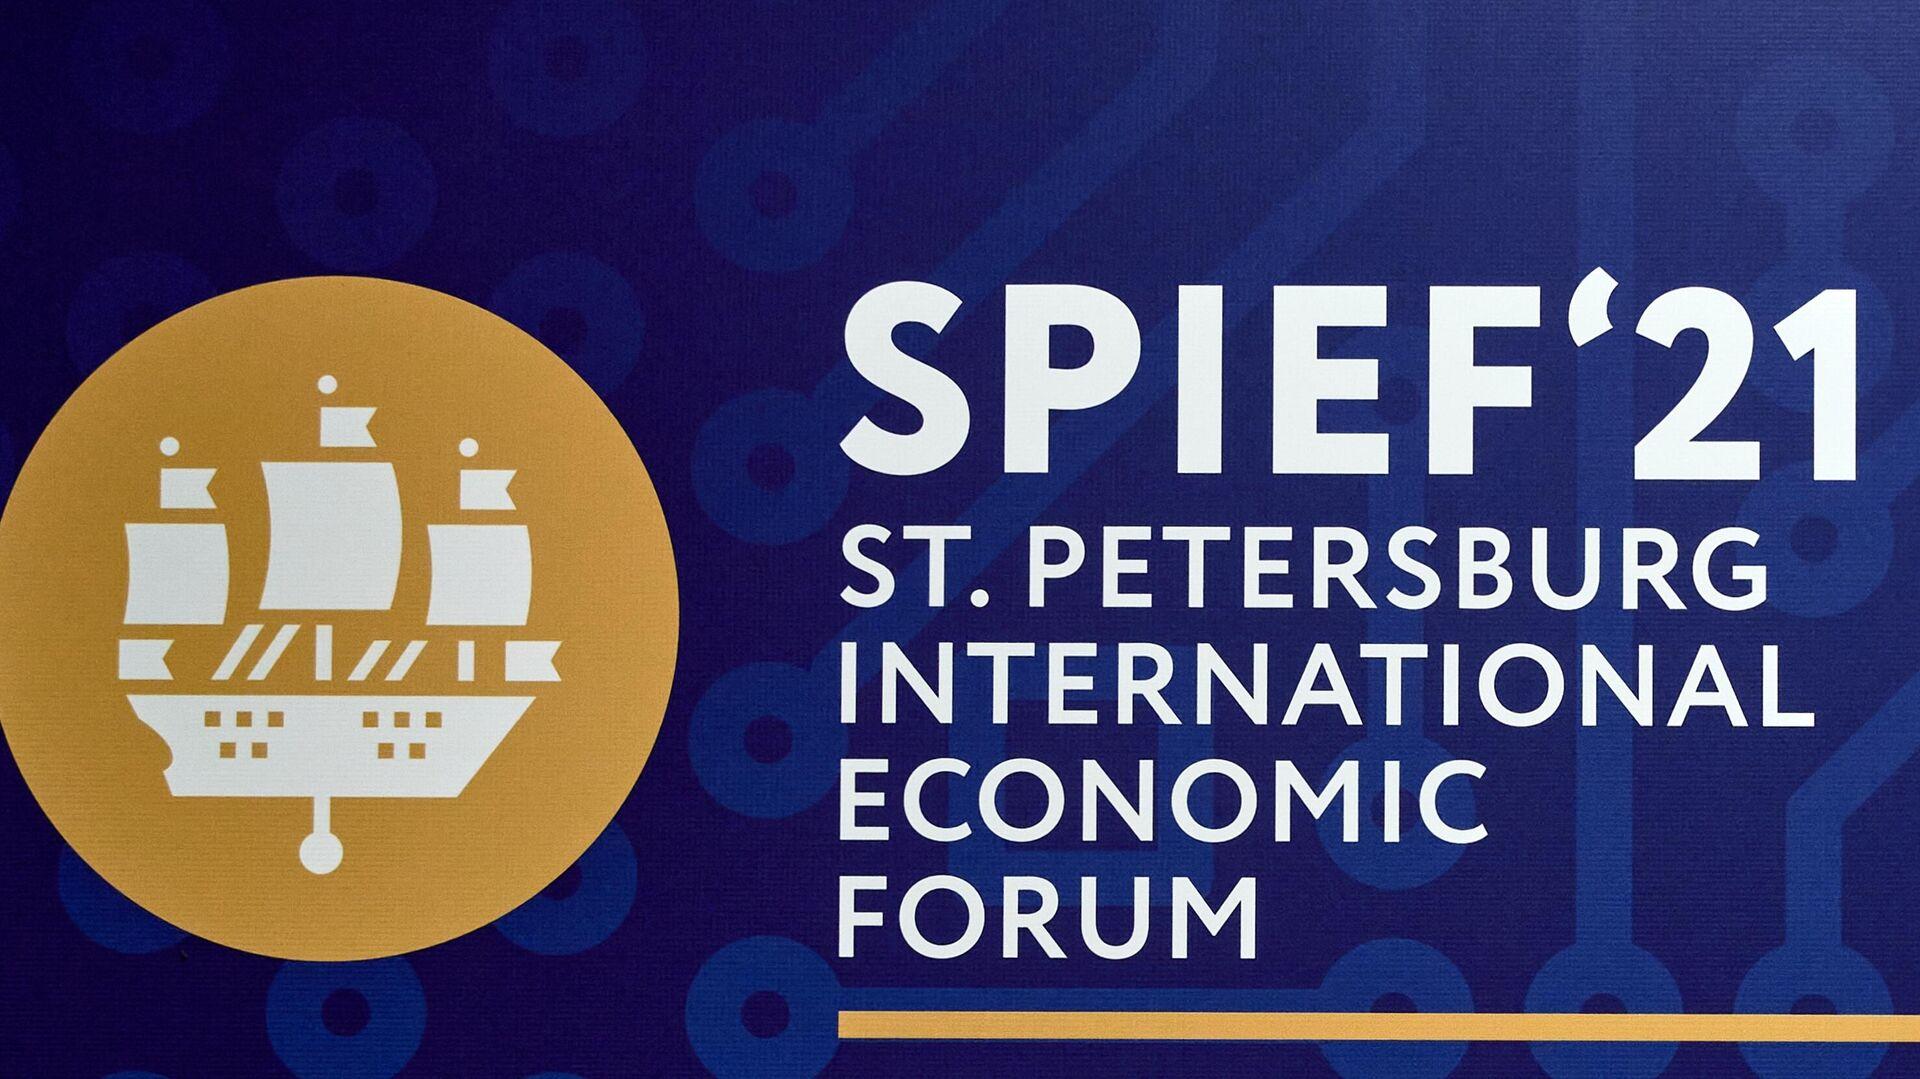 Foro Económico Internacional de San Petersburgo (SPIEF) 2021 - Sputnik Mundo, 1920, 05.06.2021